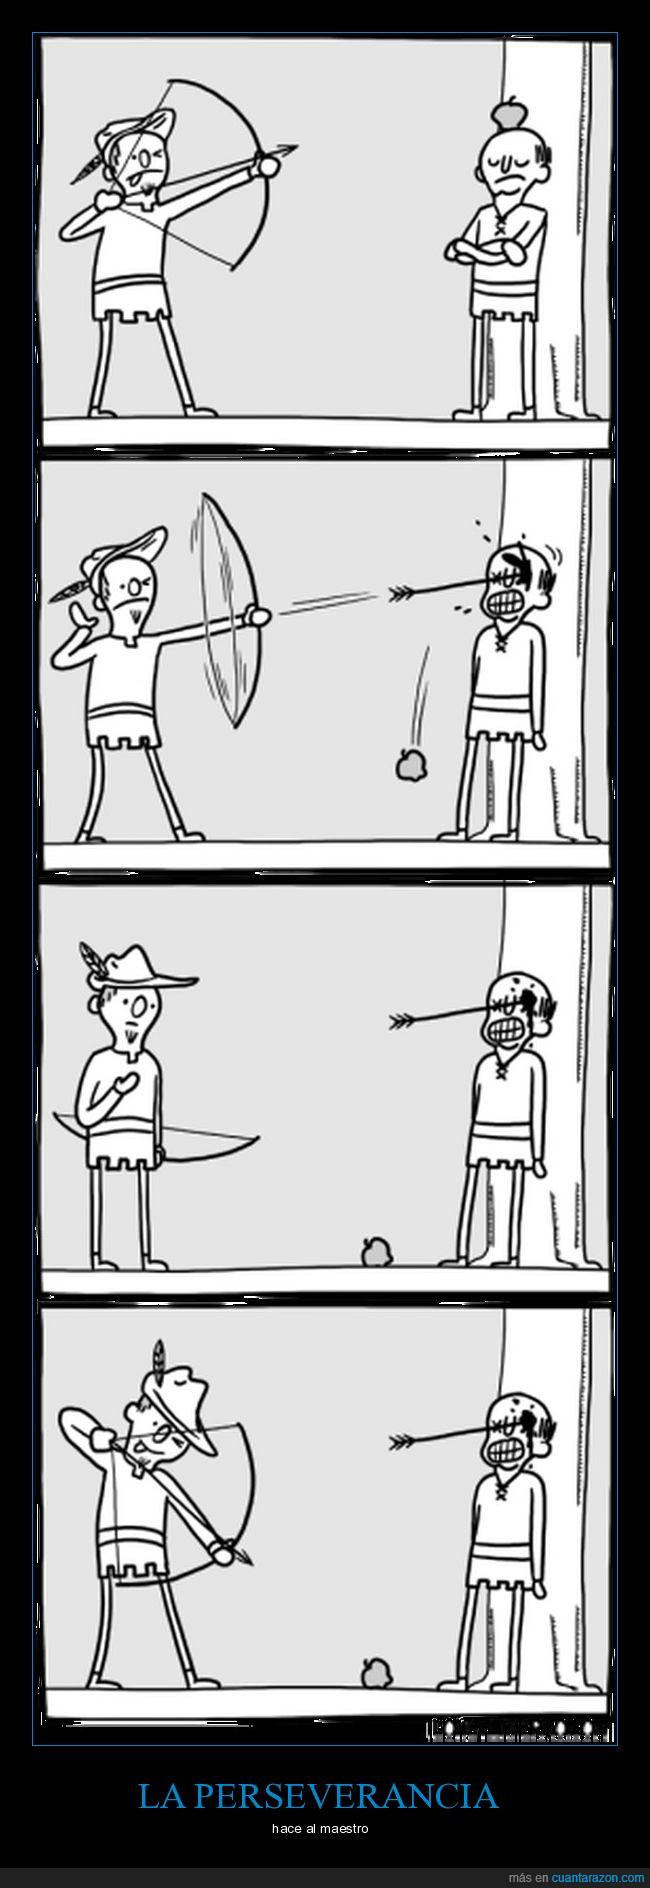 arco,flecha,guillermo tell,manzana